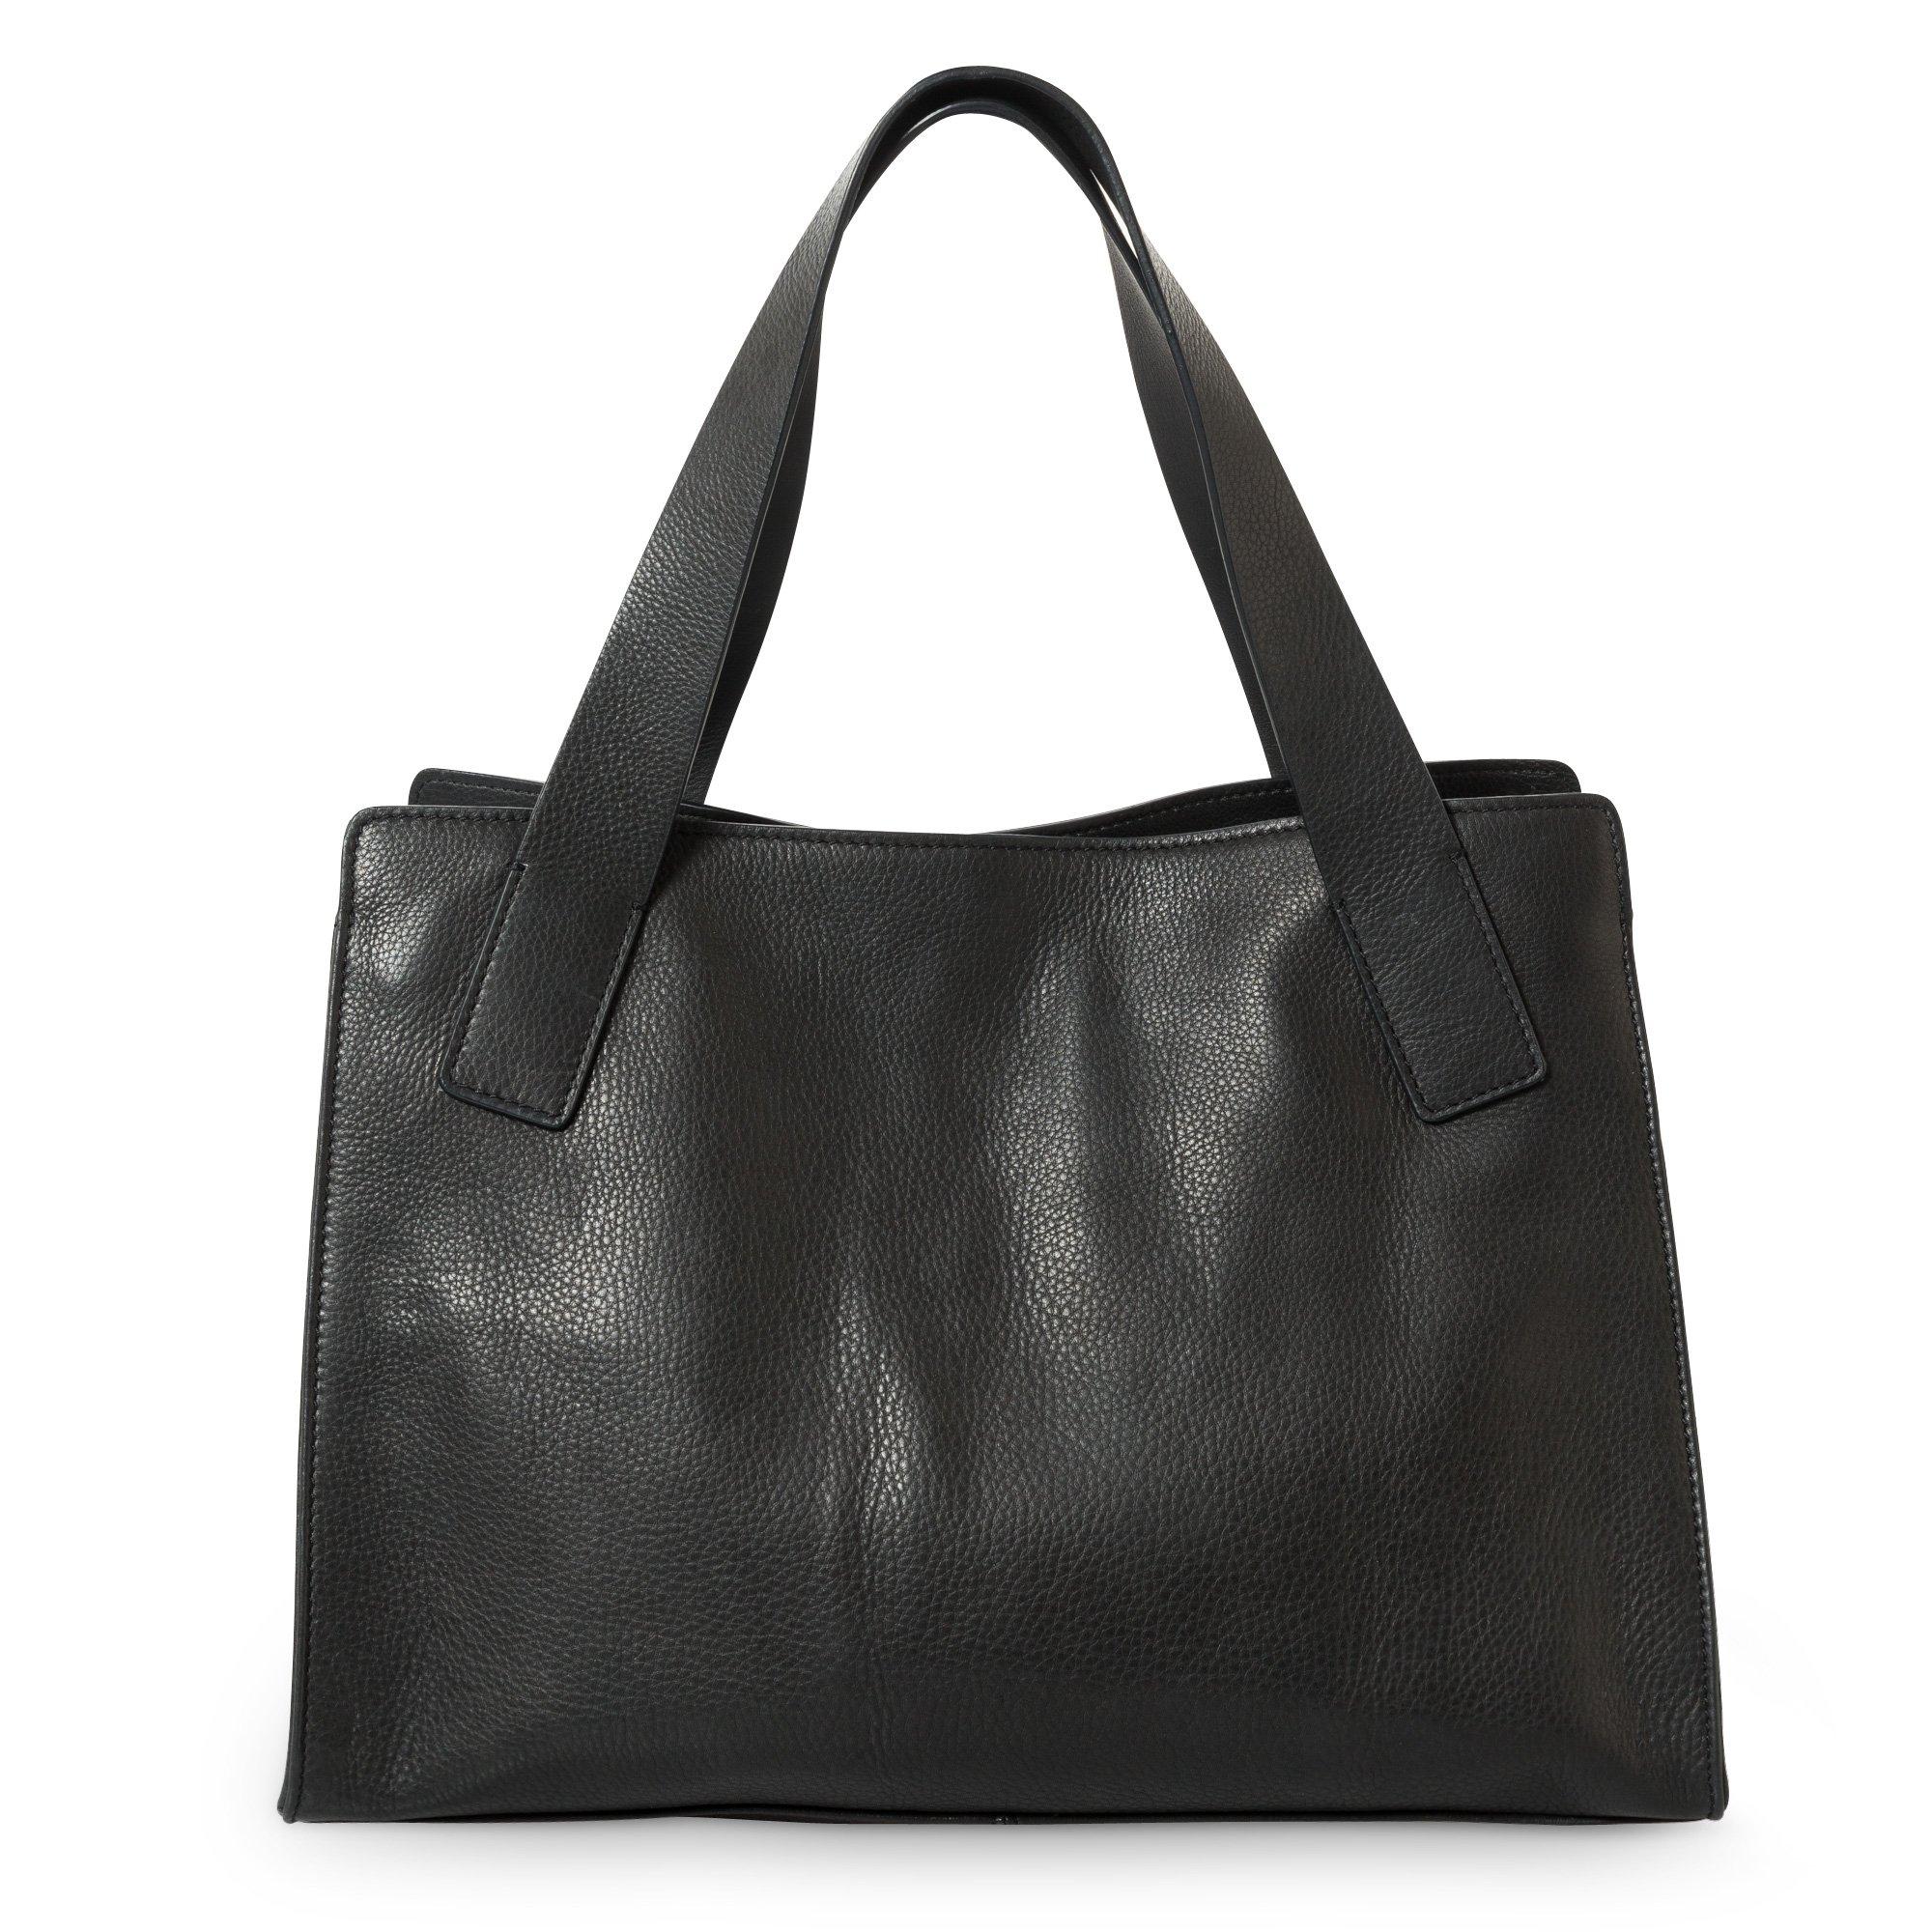 759974080c Best Black Esme Medium Leather Tote Bag | Oliver Bonas NJ14